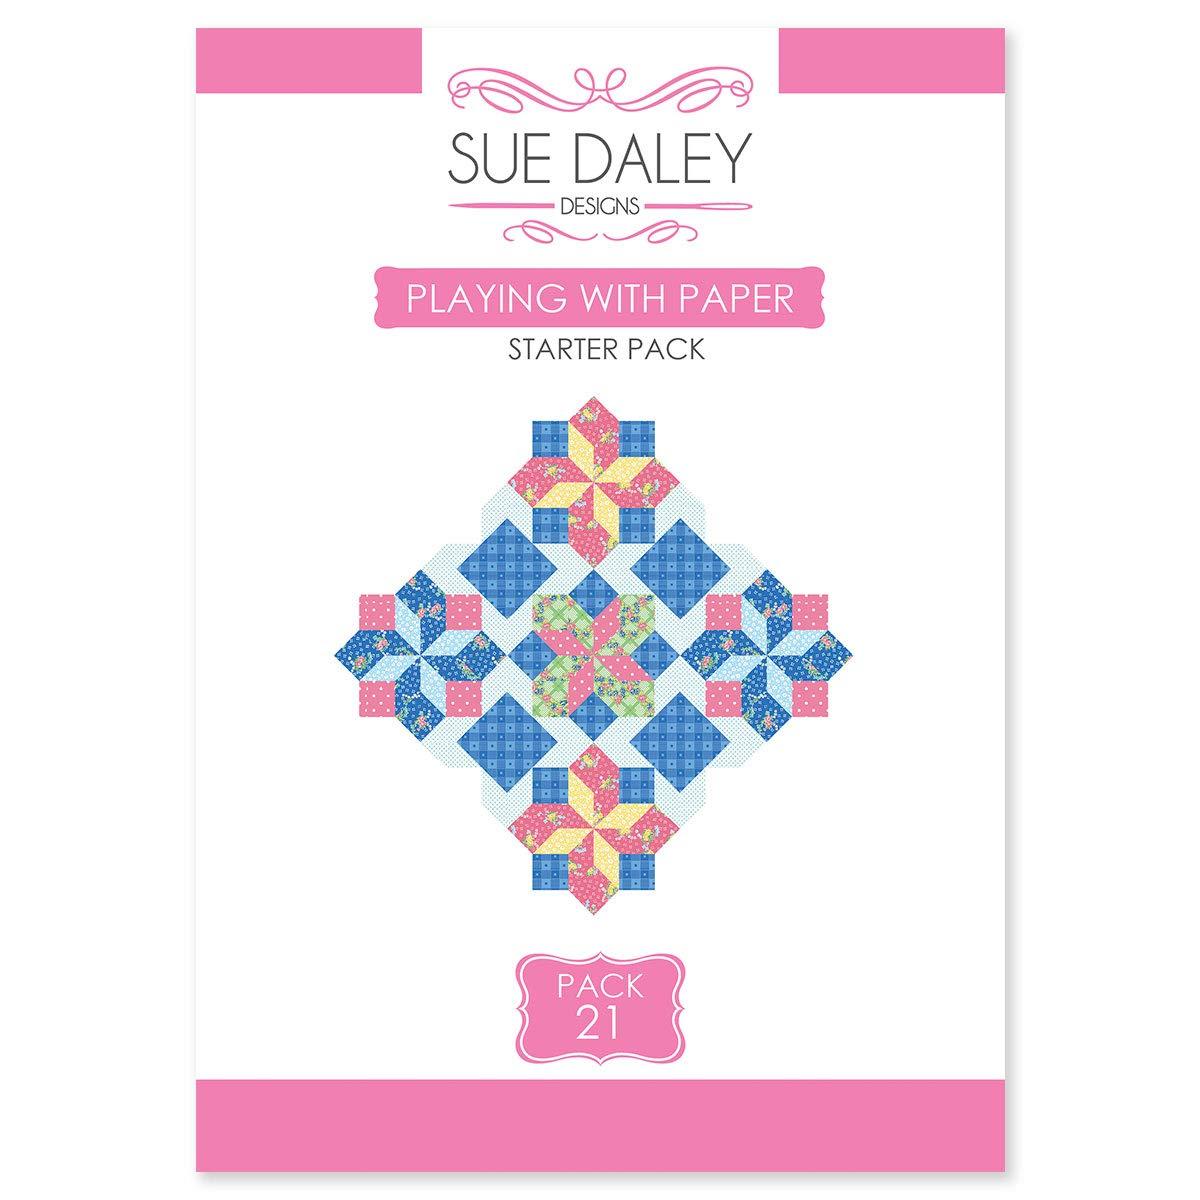 Sue Daley Designs 紙スターターパック付き #21 パターンテンプレートと紙 EPP 英語のペーパーピース付き B07HQVVNZ8